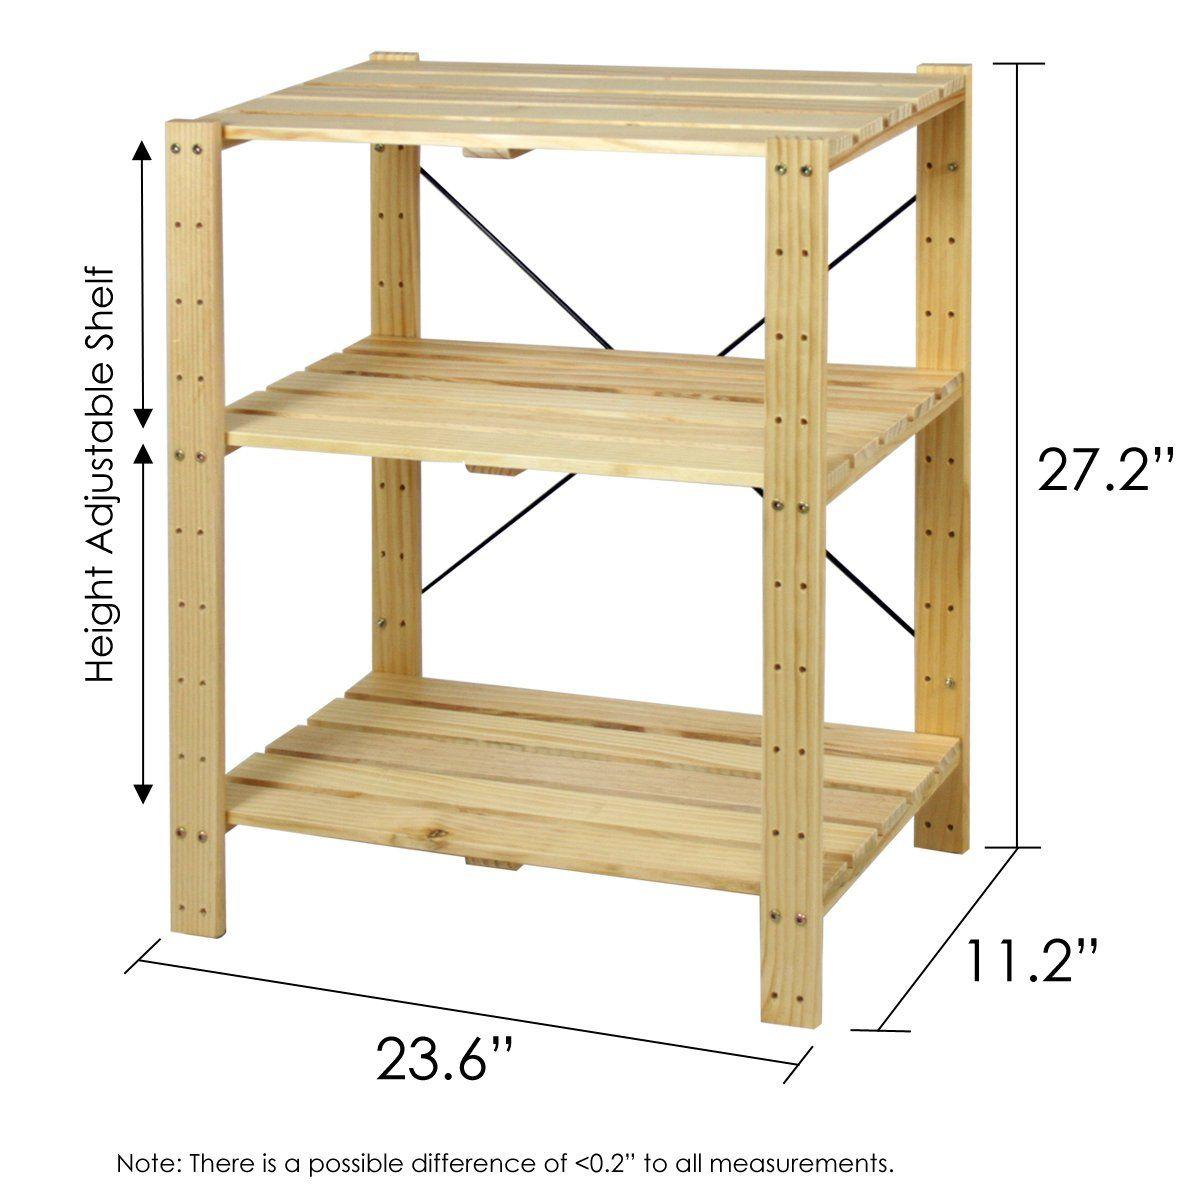 39 Amazon Com Furinno Fncj 33013 Pine Solid Wood 3 Tier Shelf Bookcases Bookshelves Diy